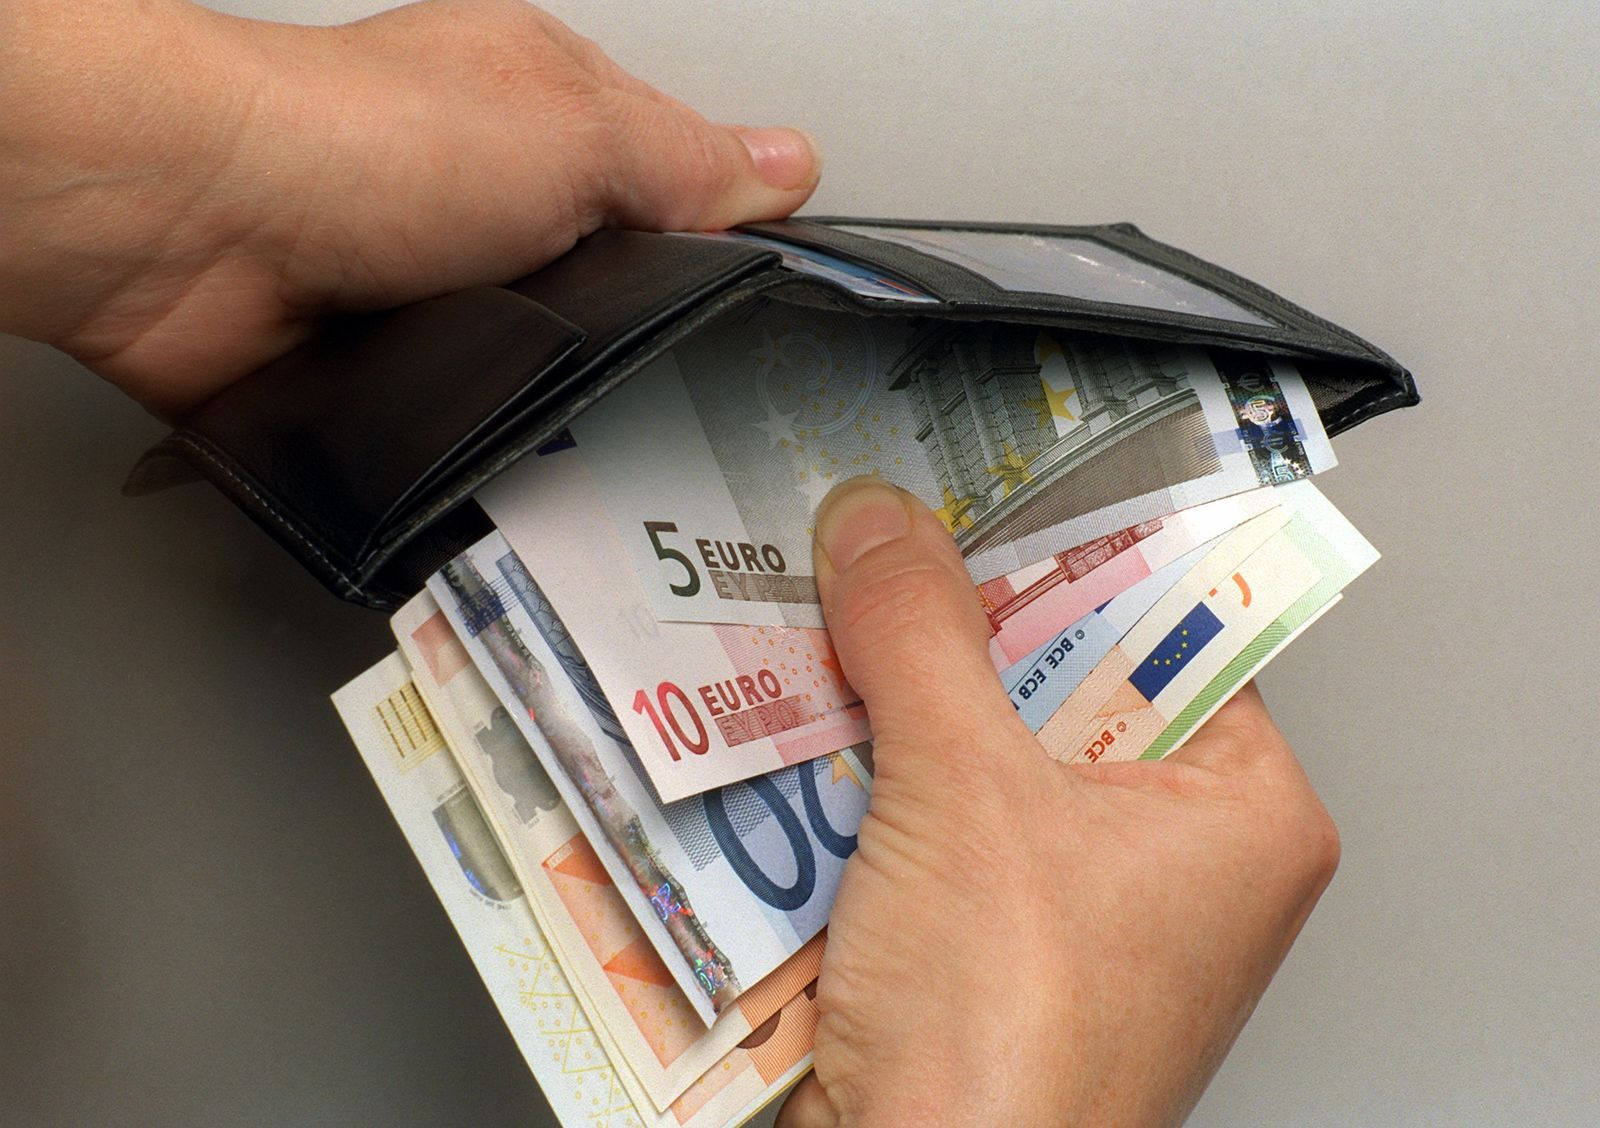 KaSP Euro-Geldbörse Banknoten SYMBOLBILD